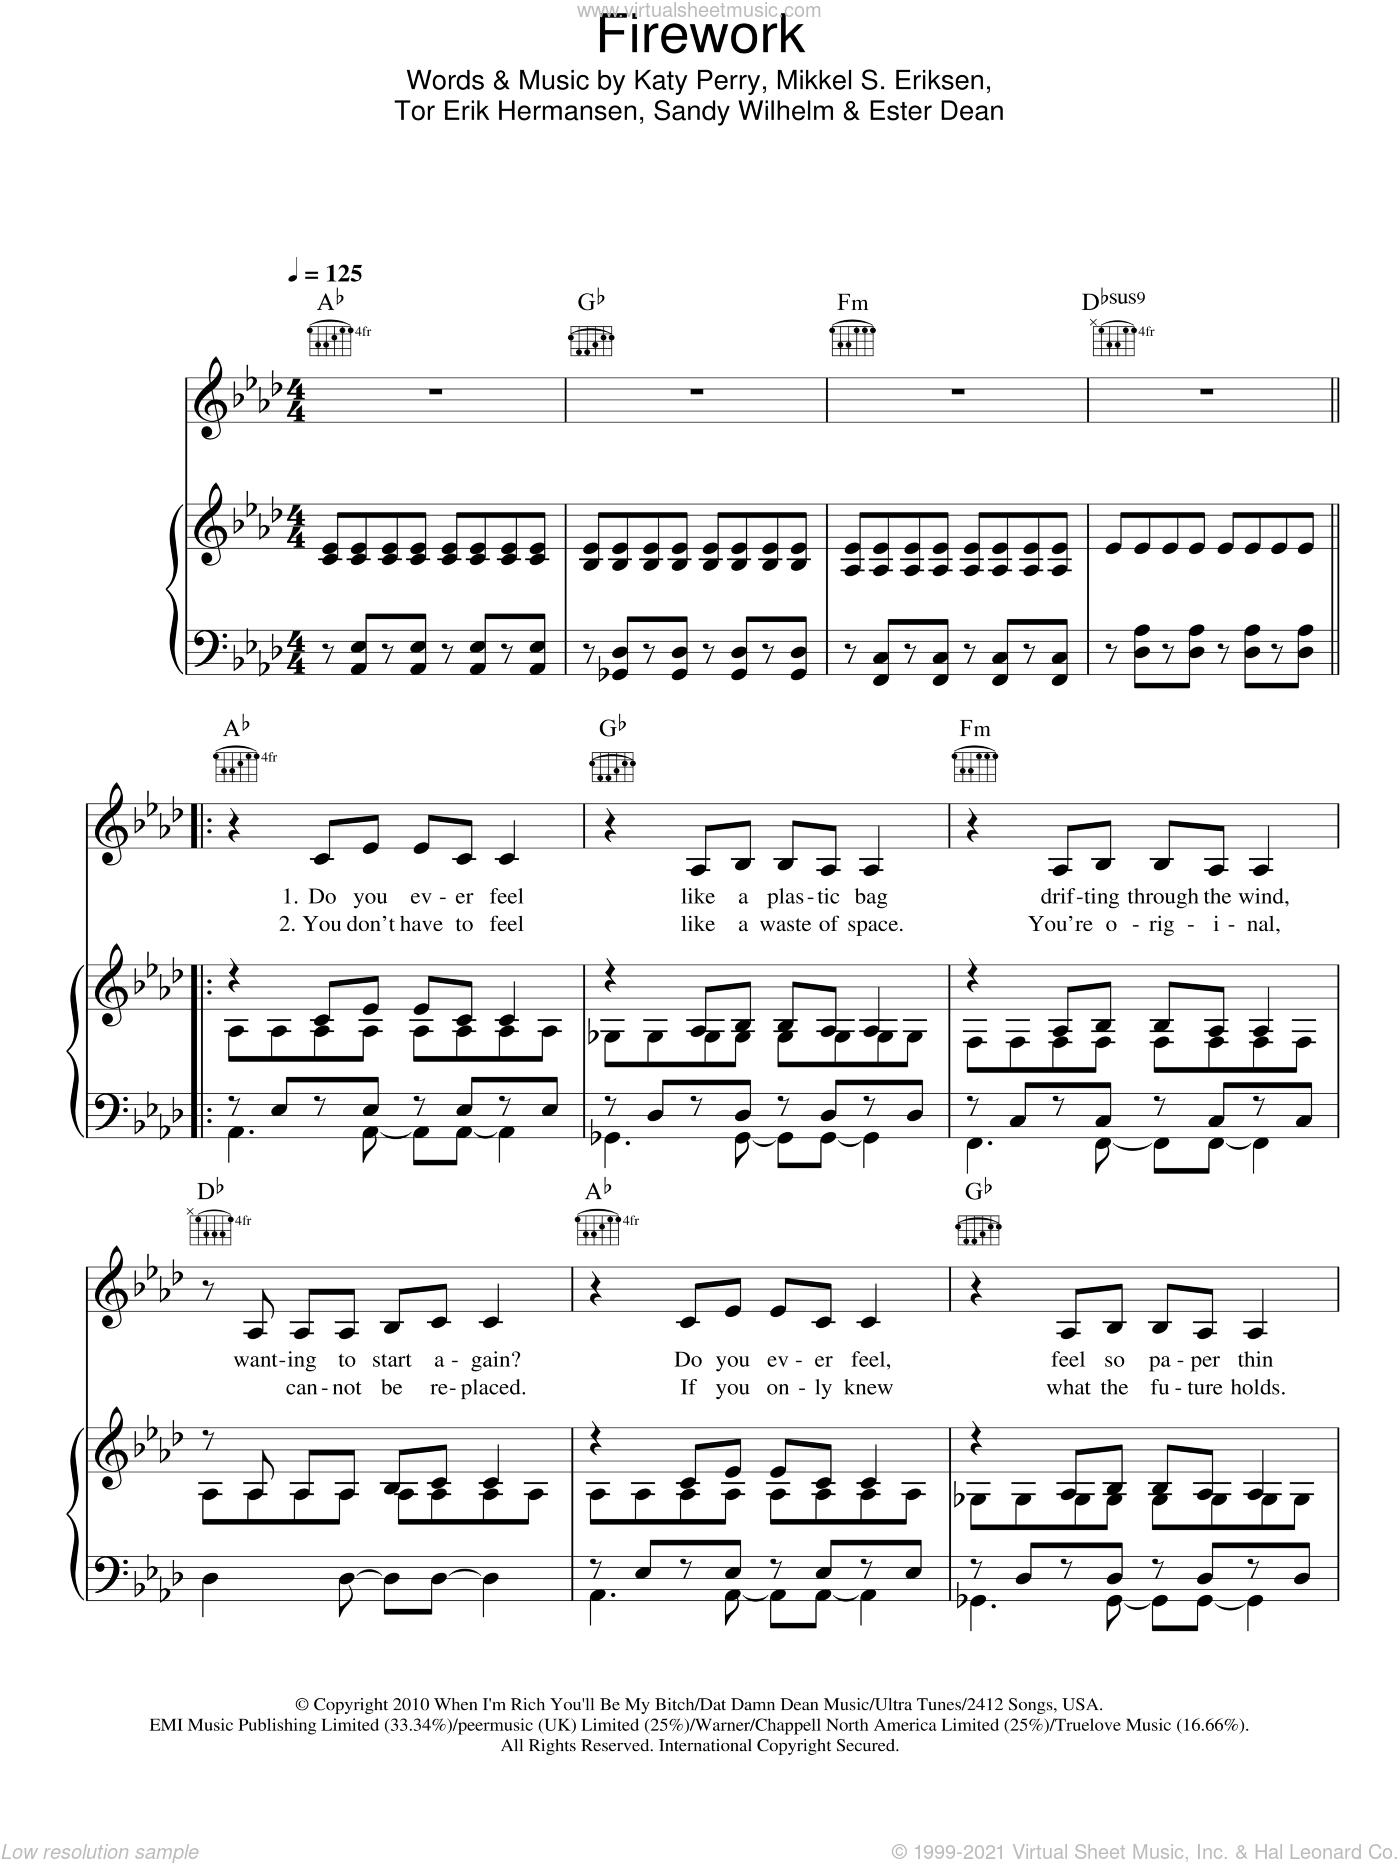 Firework sheet music for voice, piano or guitar by Katy Perry, Ester Dean, Mikkel S. Eriksen, Sandy Wilhelm and Tor Erik Hermansen, intermediate skill level